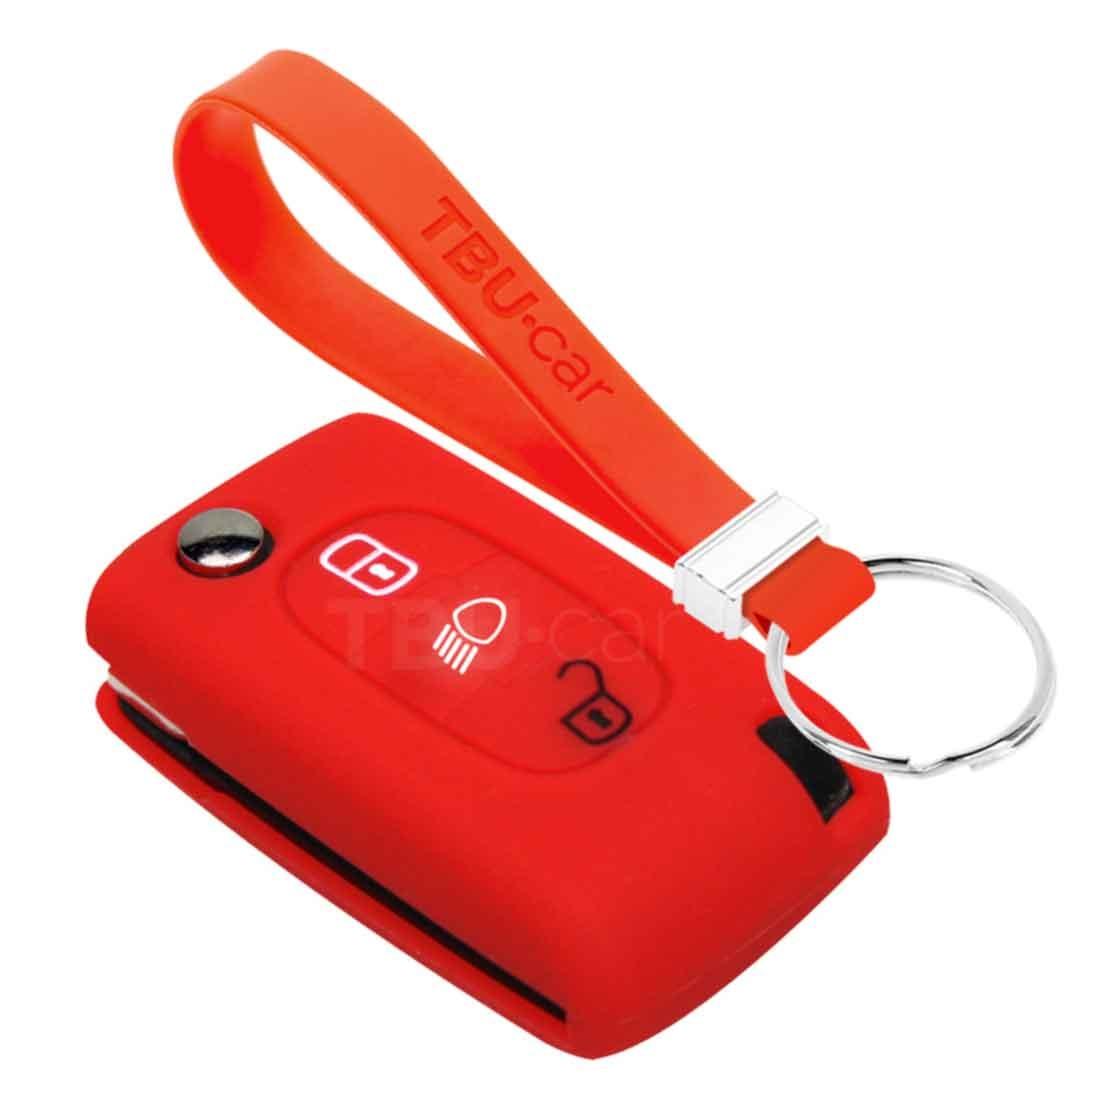 TBU car TBU car Sleutel cover compatibel met Citroën - Silicone sleutelhoesje - beschermhoesje autosleutel - Rood